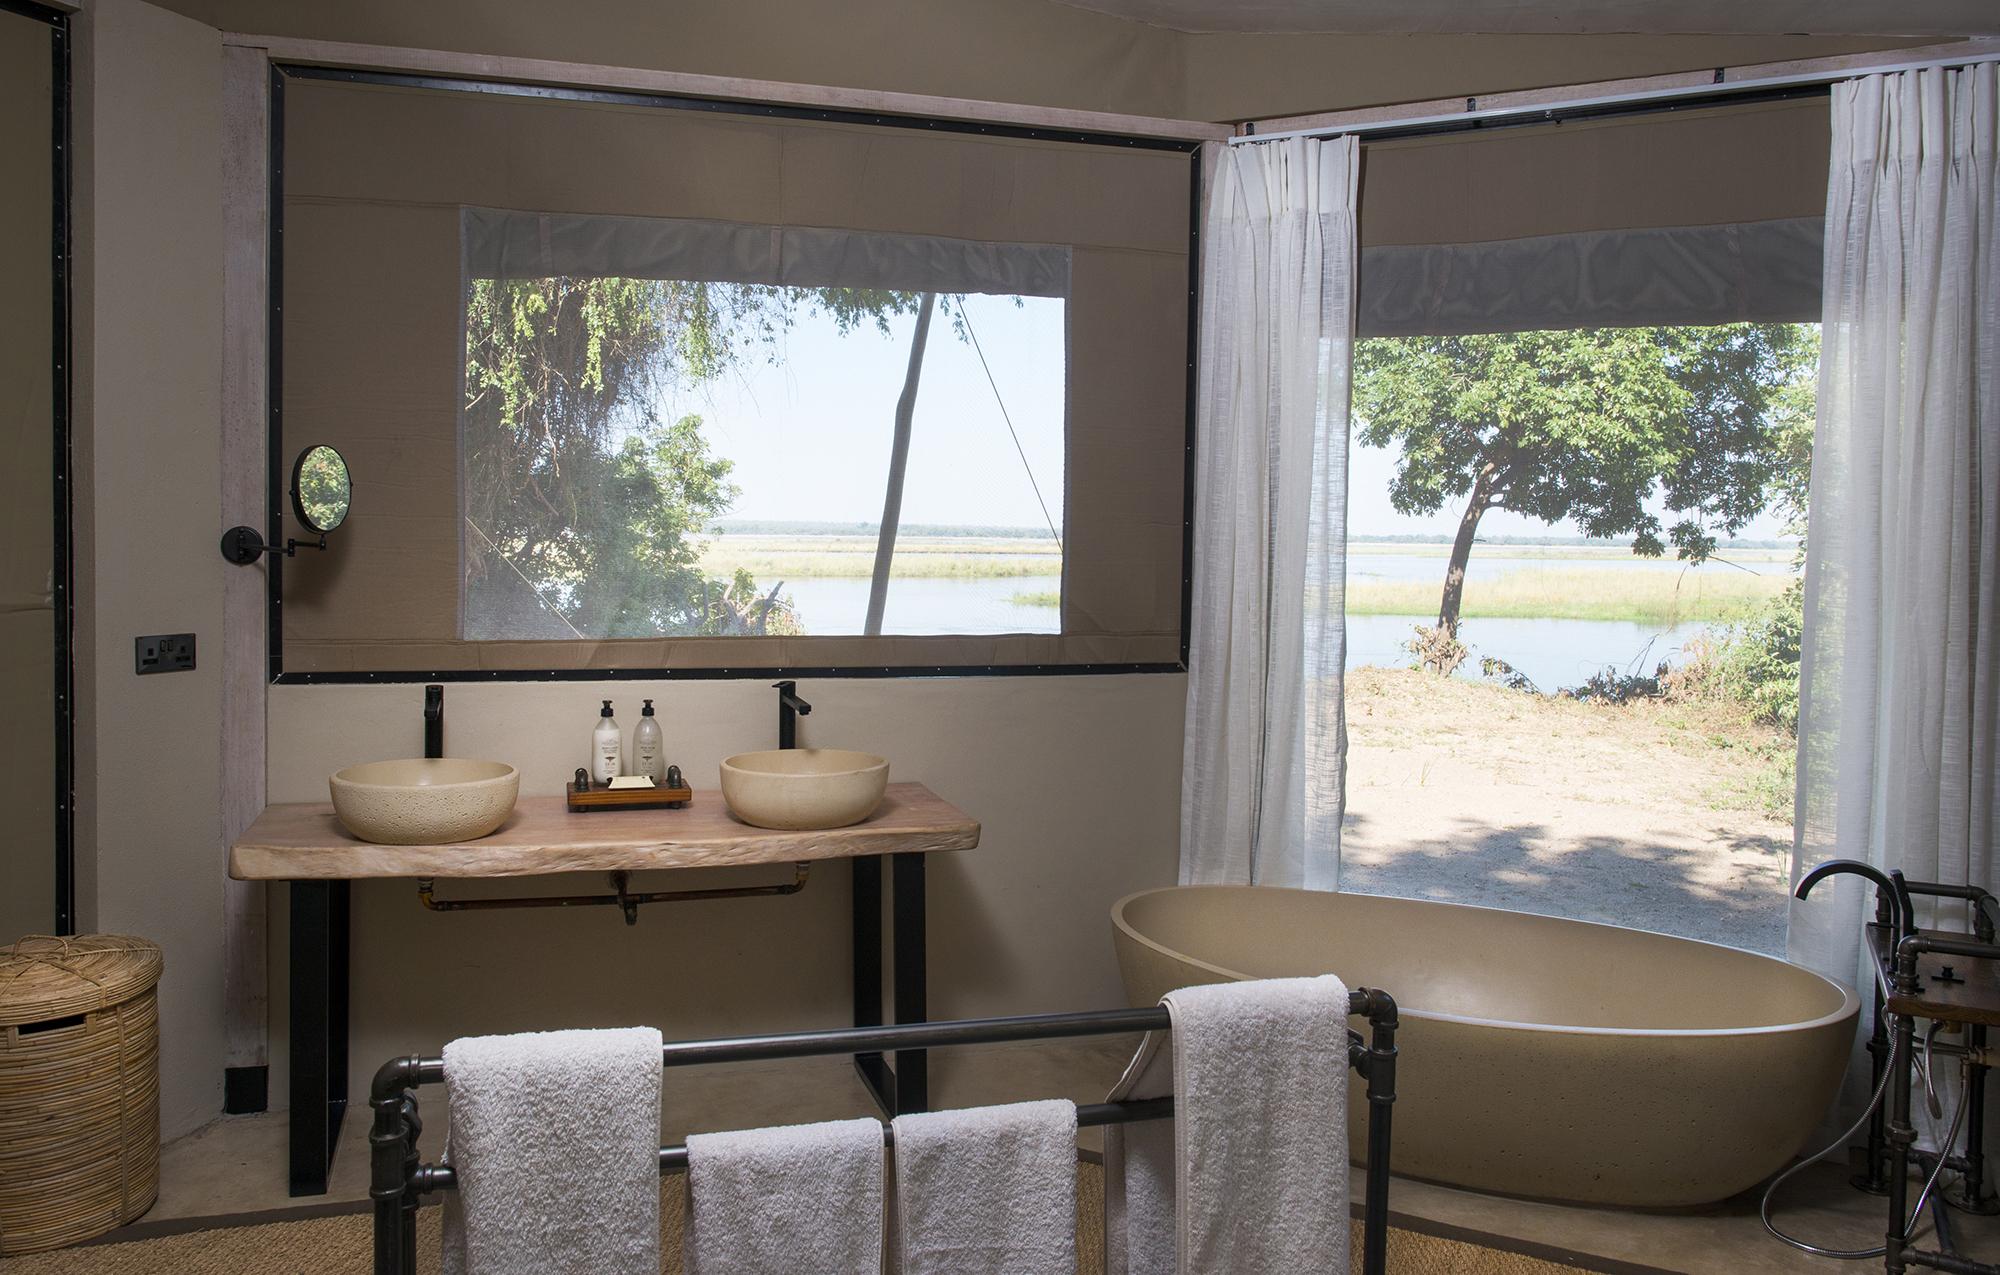 kigelia_house_bathroon3.jpg